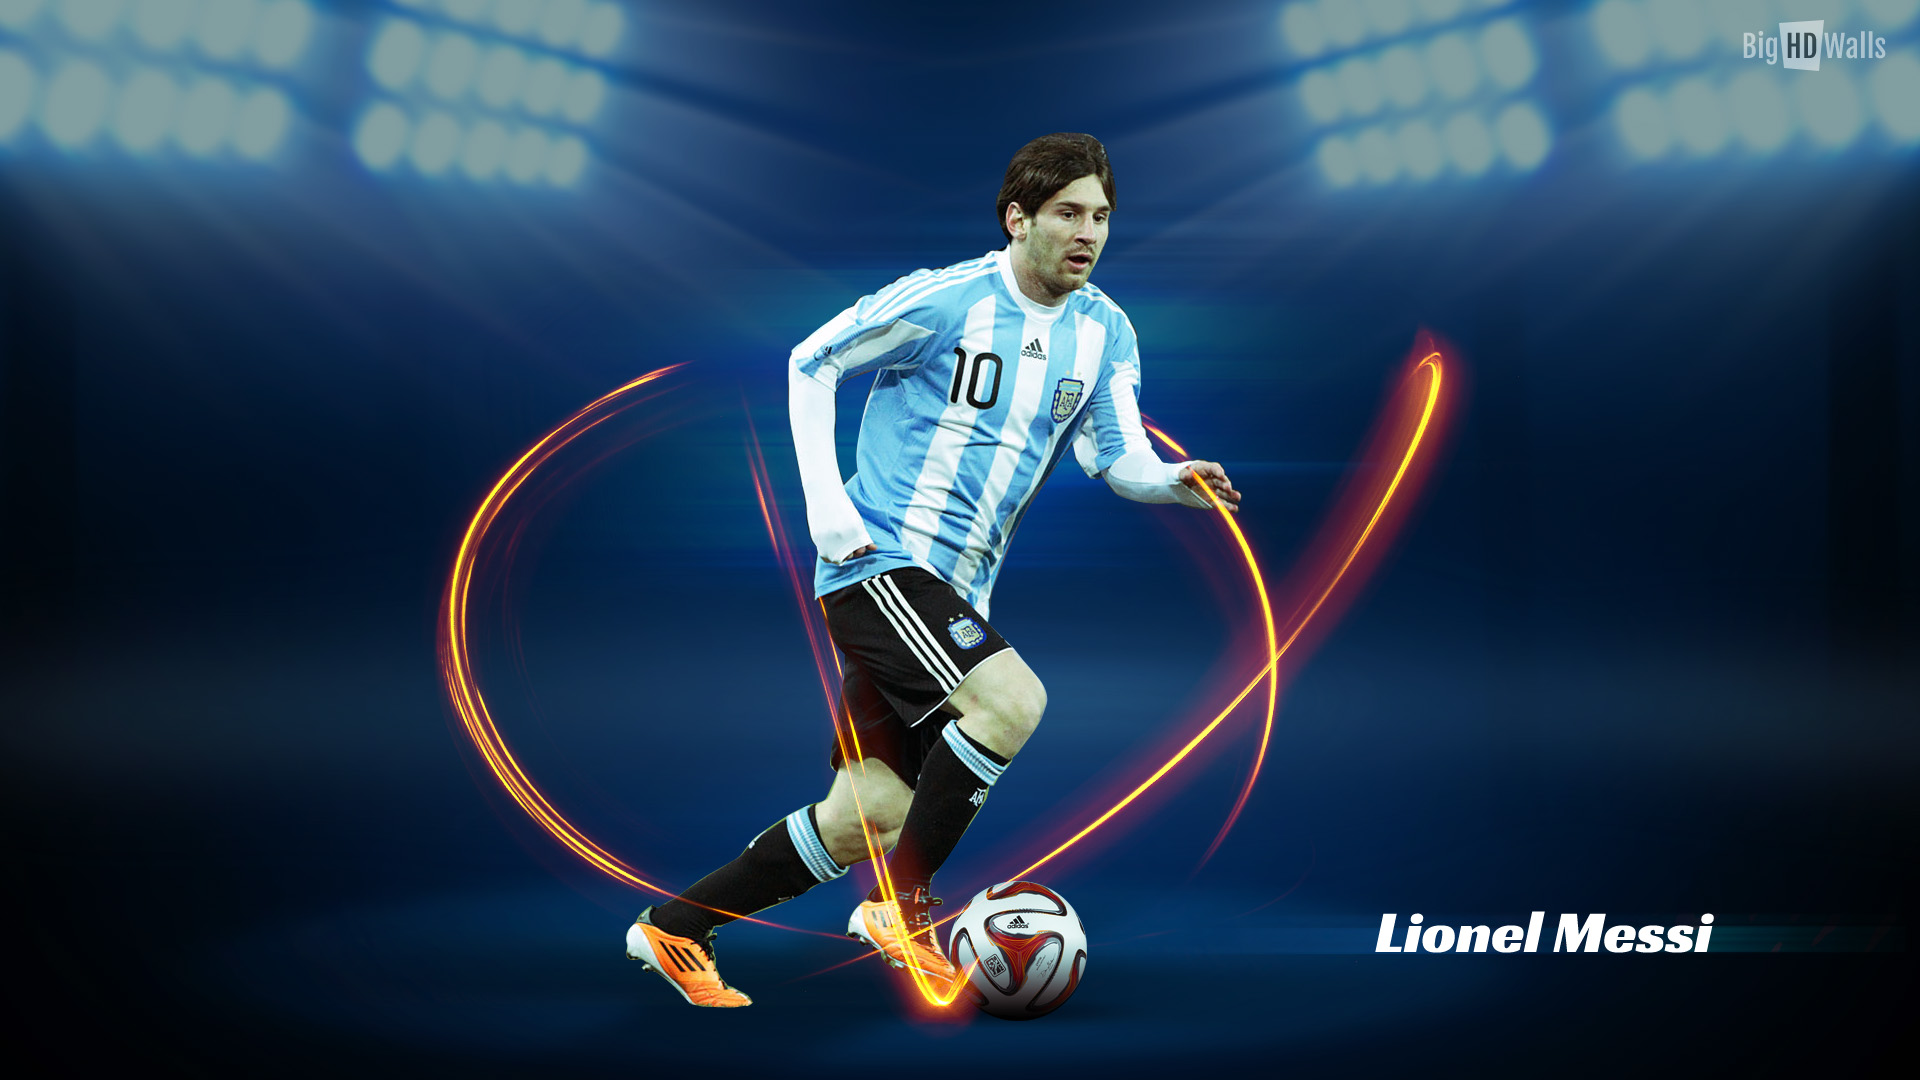 Messi Hd Wallpapers 1080p Messi Argentina Wallpapers Background Hd Pixelstalk Net